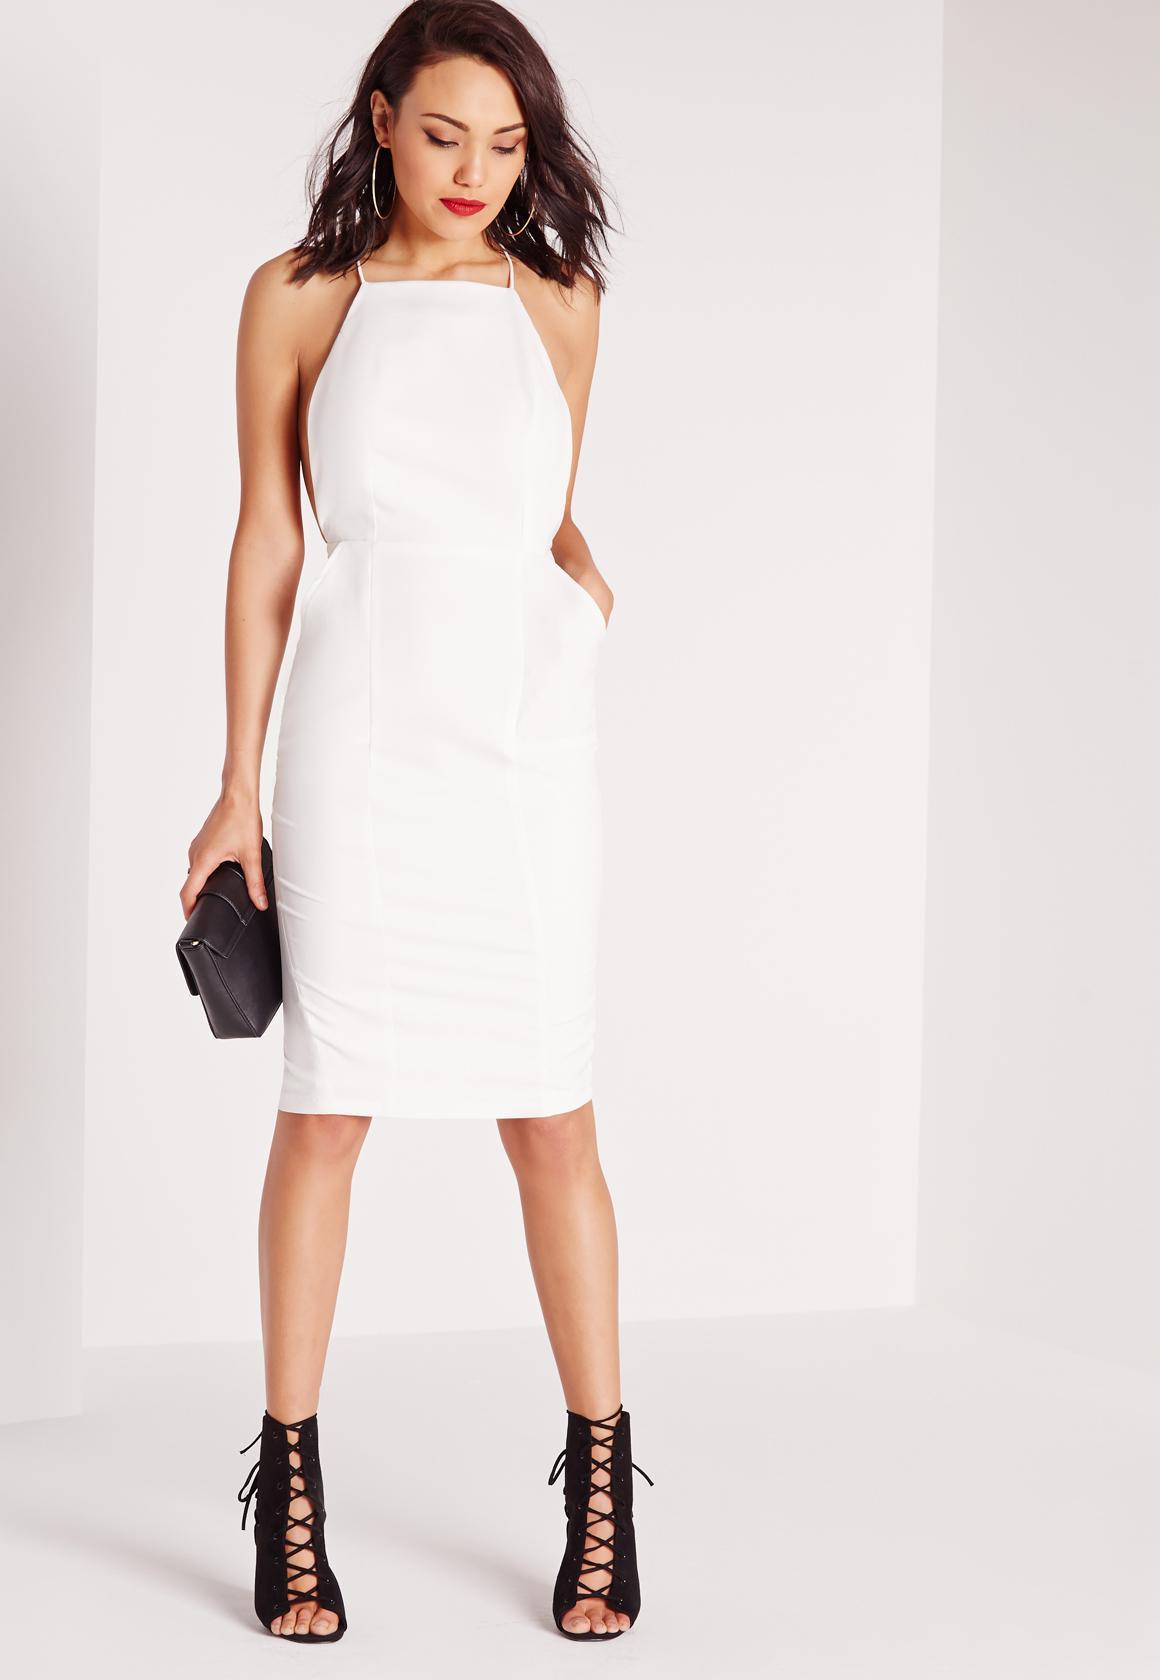 Wedding Spaghetti Strap Dress square neck spaghetti strap midi dress white missguided white